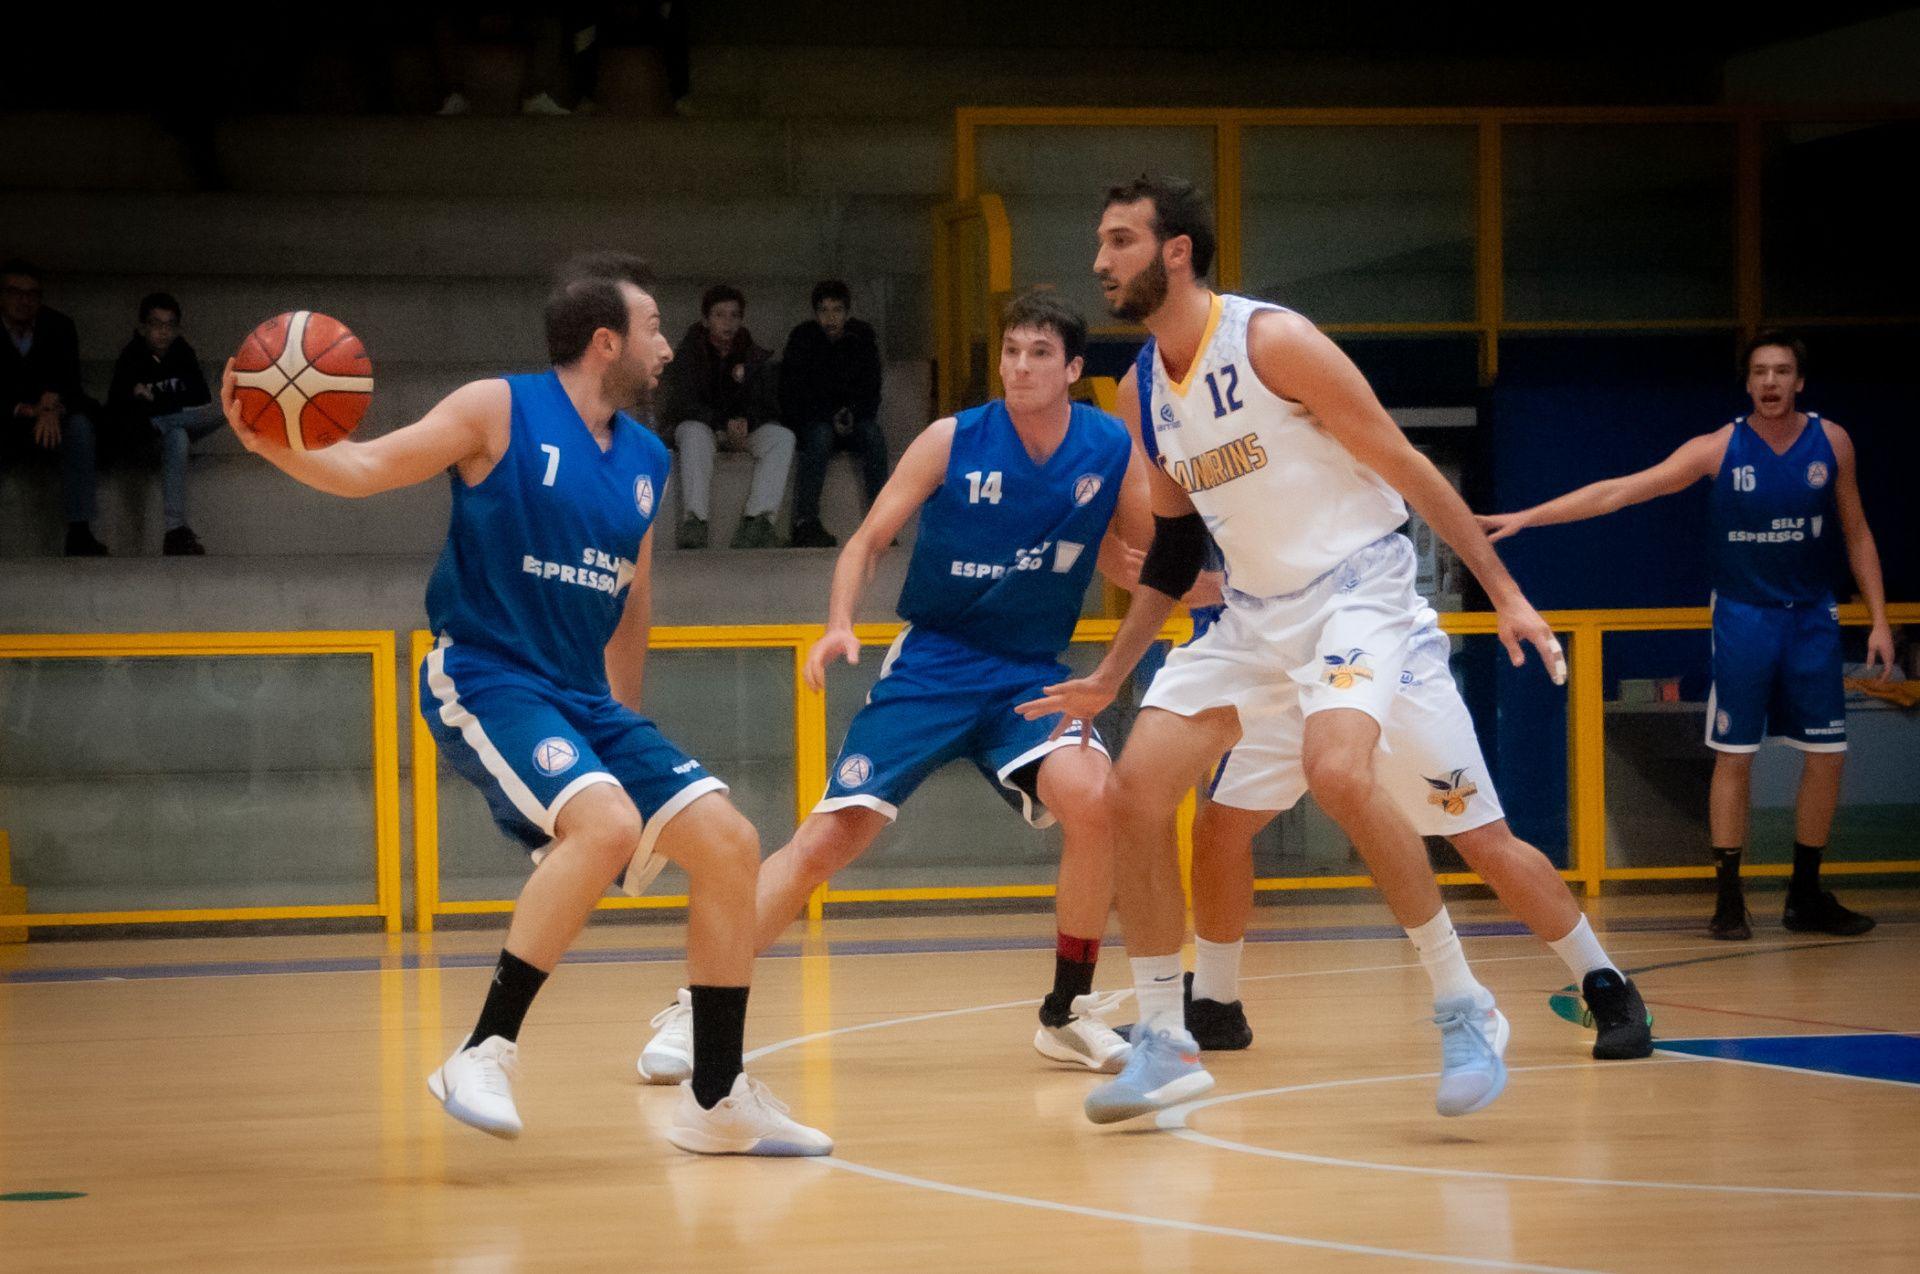 Serie C: Basket Cusano 69 – Nuova Argentia Pallacanestro 83